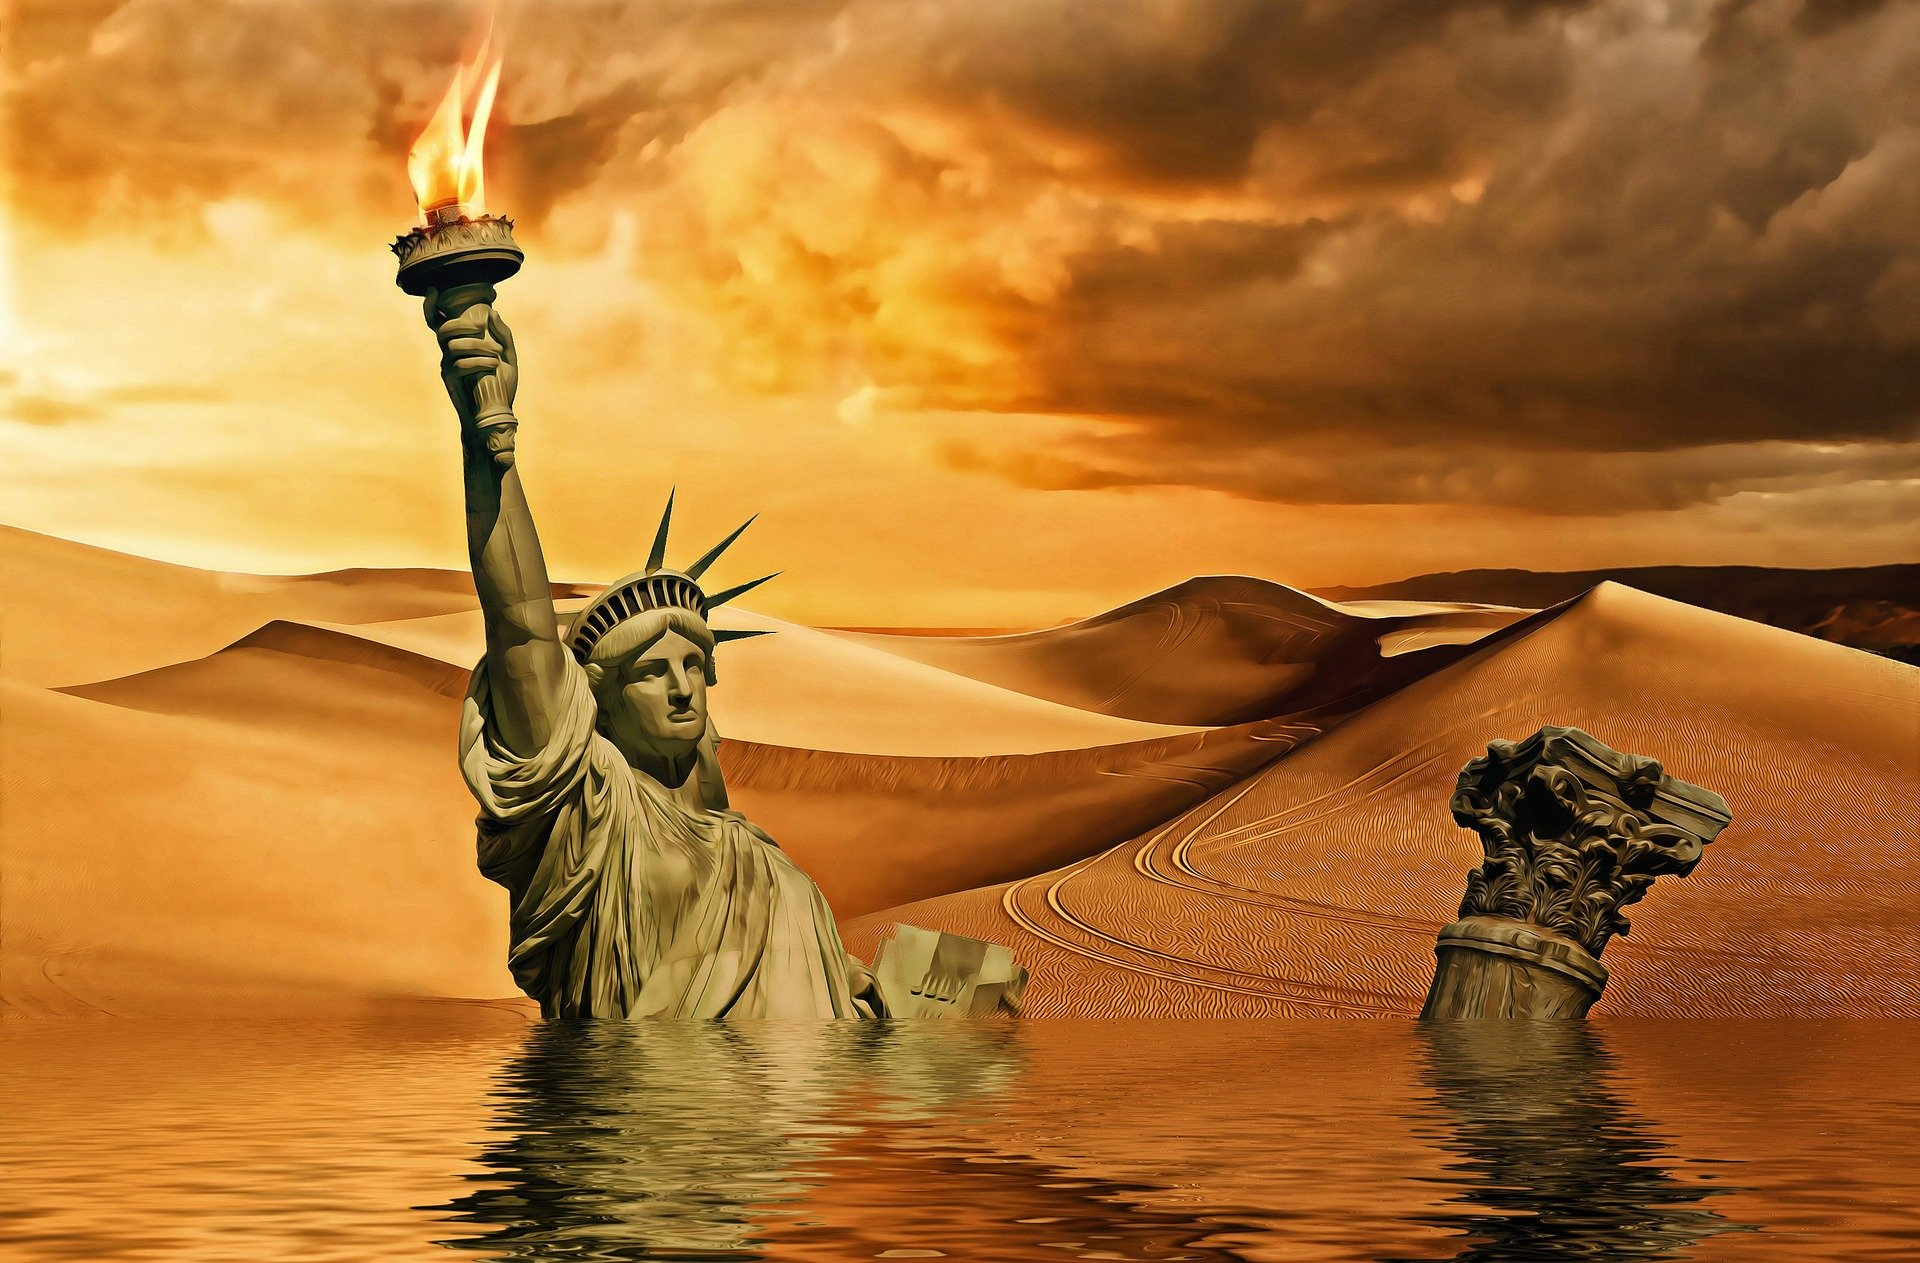 https://pixabay.com/fr/illustrations/apocalyptique-apocalypse-2392380/